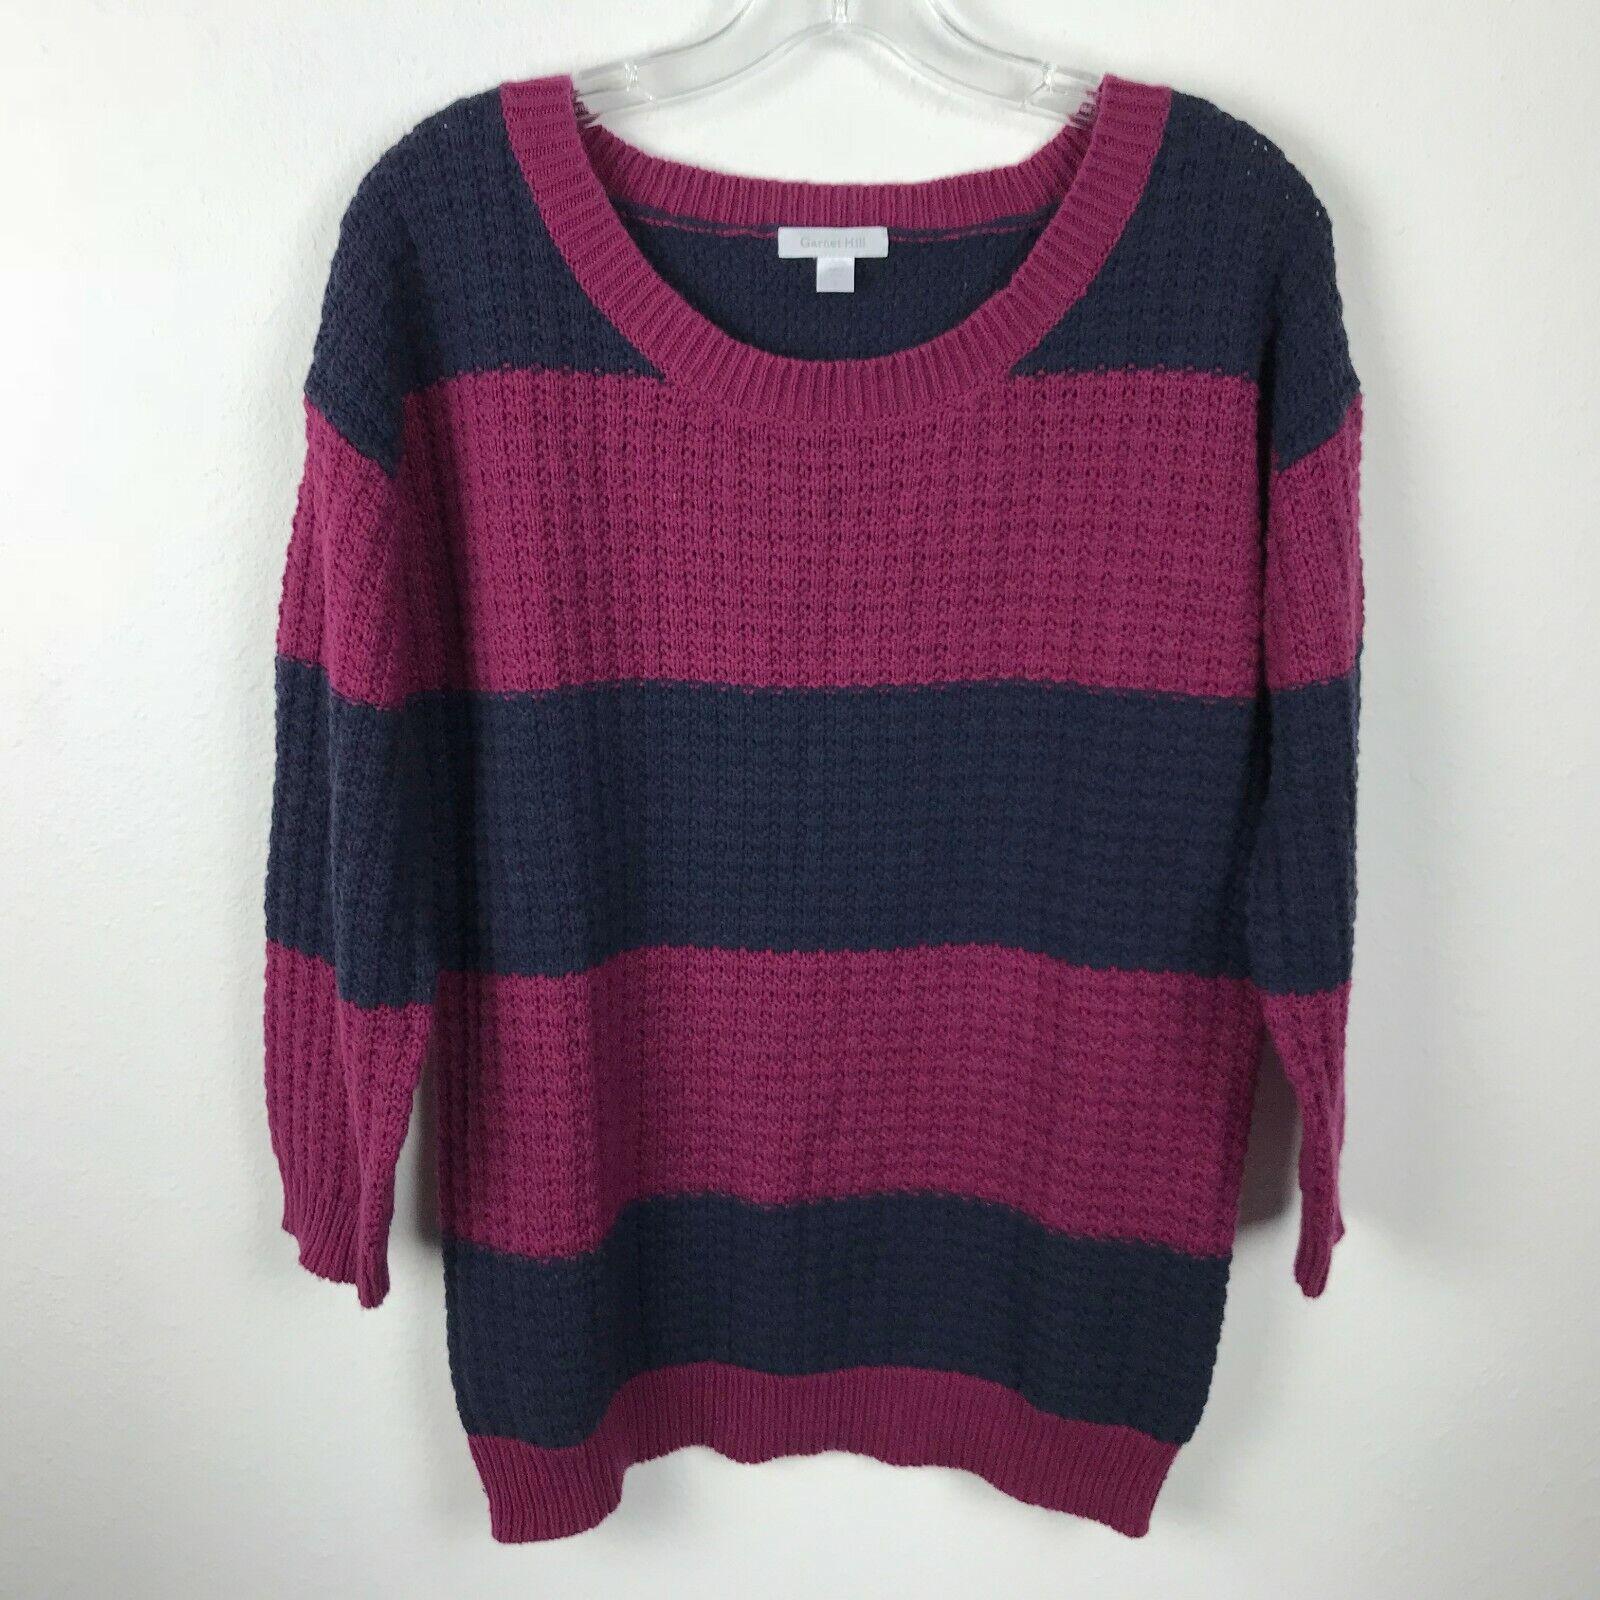 Garnet Hill Sweater Size S Maroon Navy bluee Striped Cotton Nylon Wool Womens